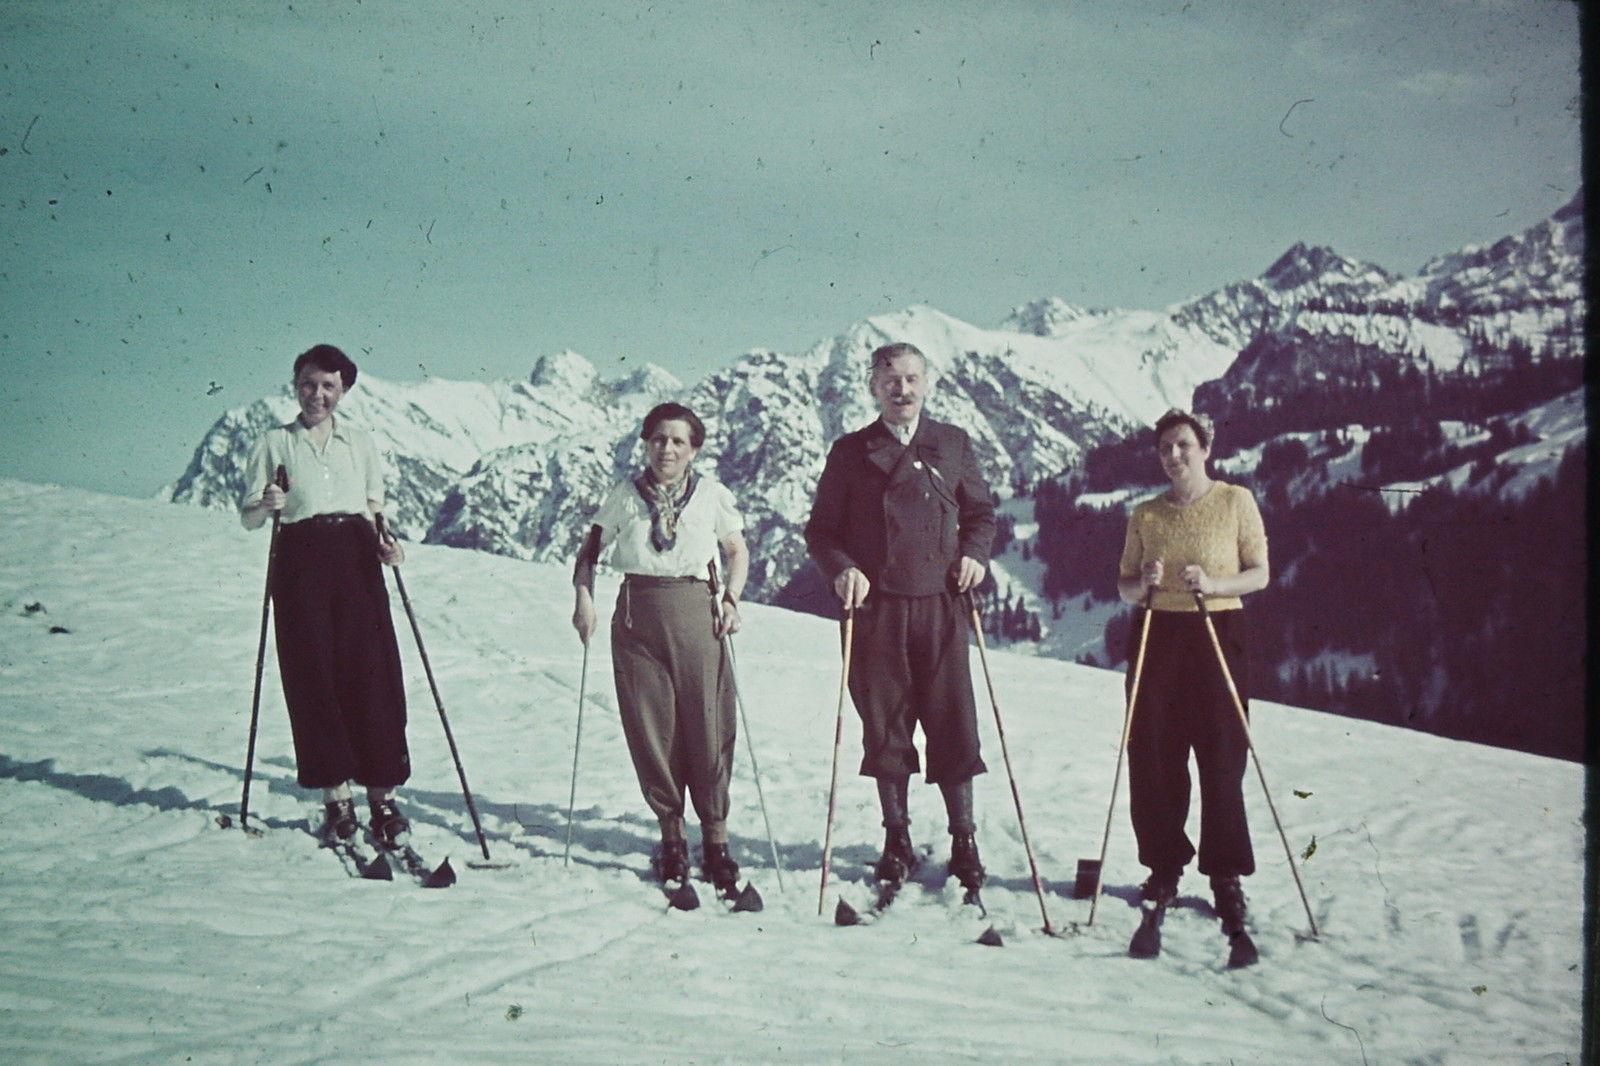 1938 Skifahrer in den Alpen